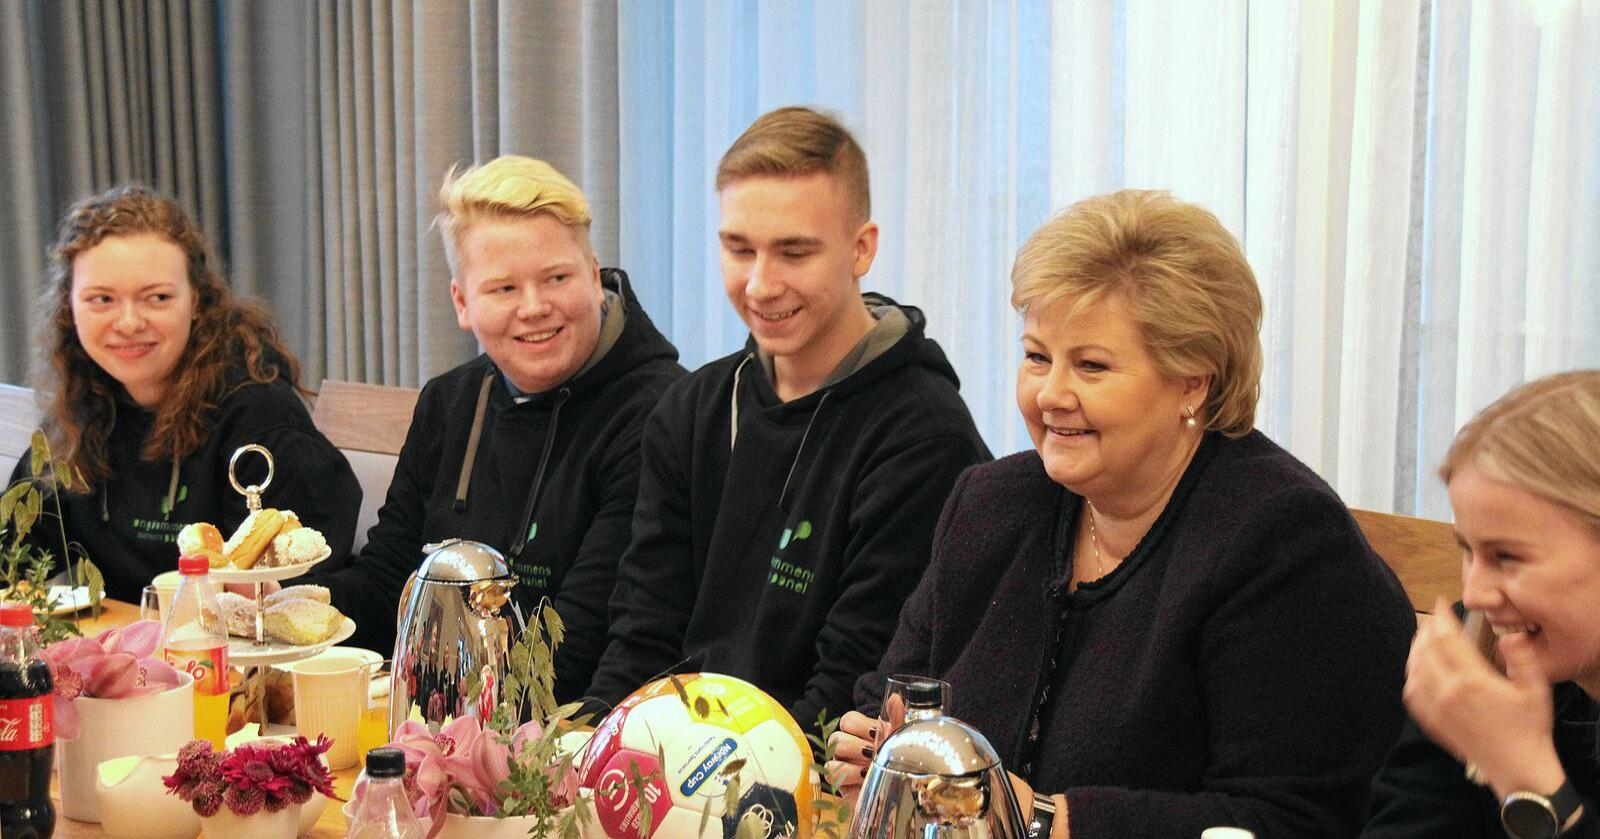 Sofie Persdatter Sangnæs (t.v.), Trym Talgø Olsen, Tobias Eriksen, Erna Solberg og Cecilie Skrindo. Foto: Line Omland Eilevstjønn